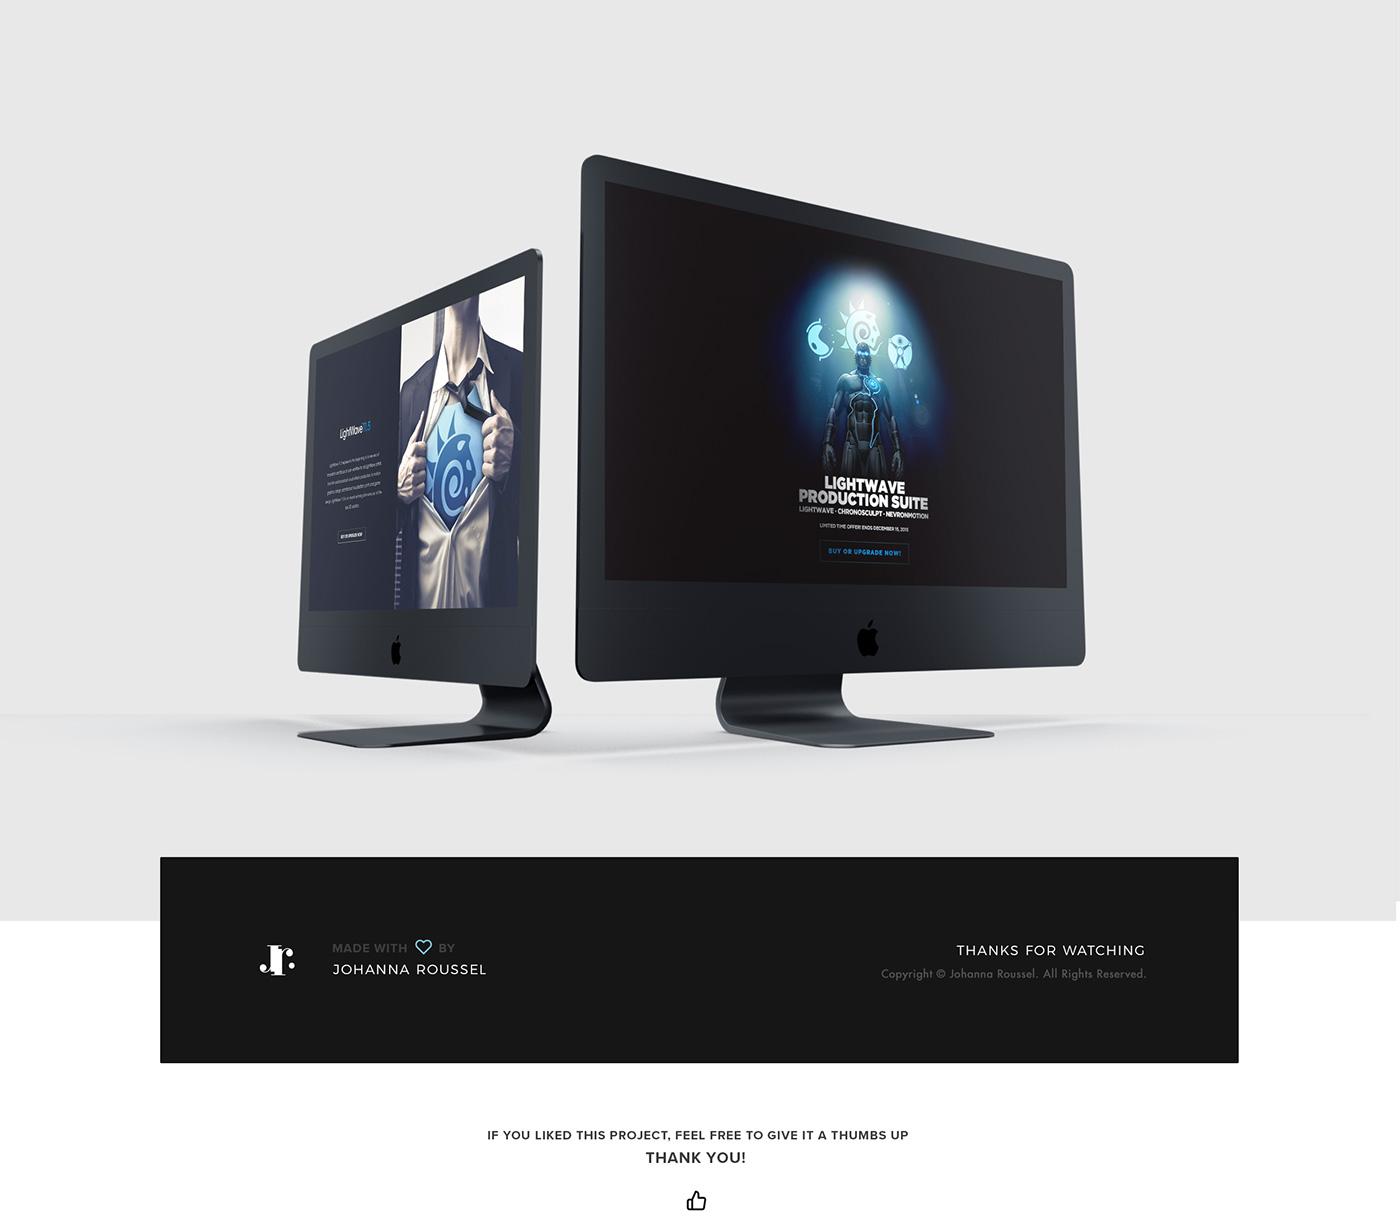 Super Hero campaign power creative ads print design  print ads Advertising  lightwave 3d